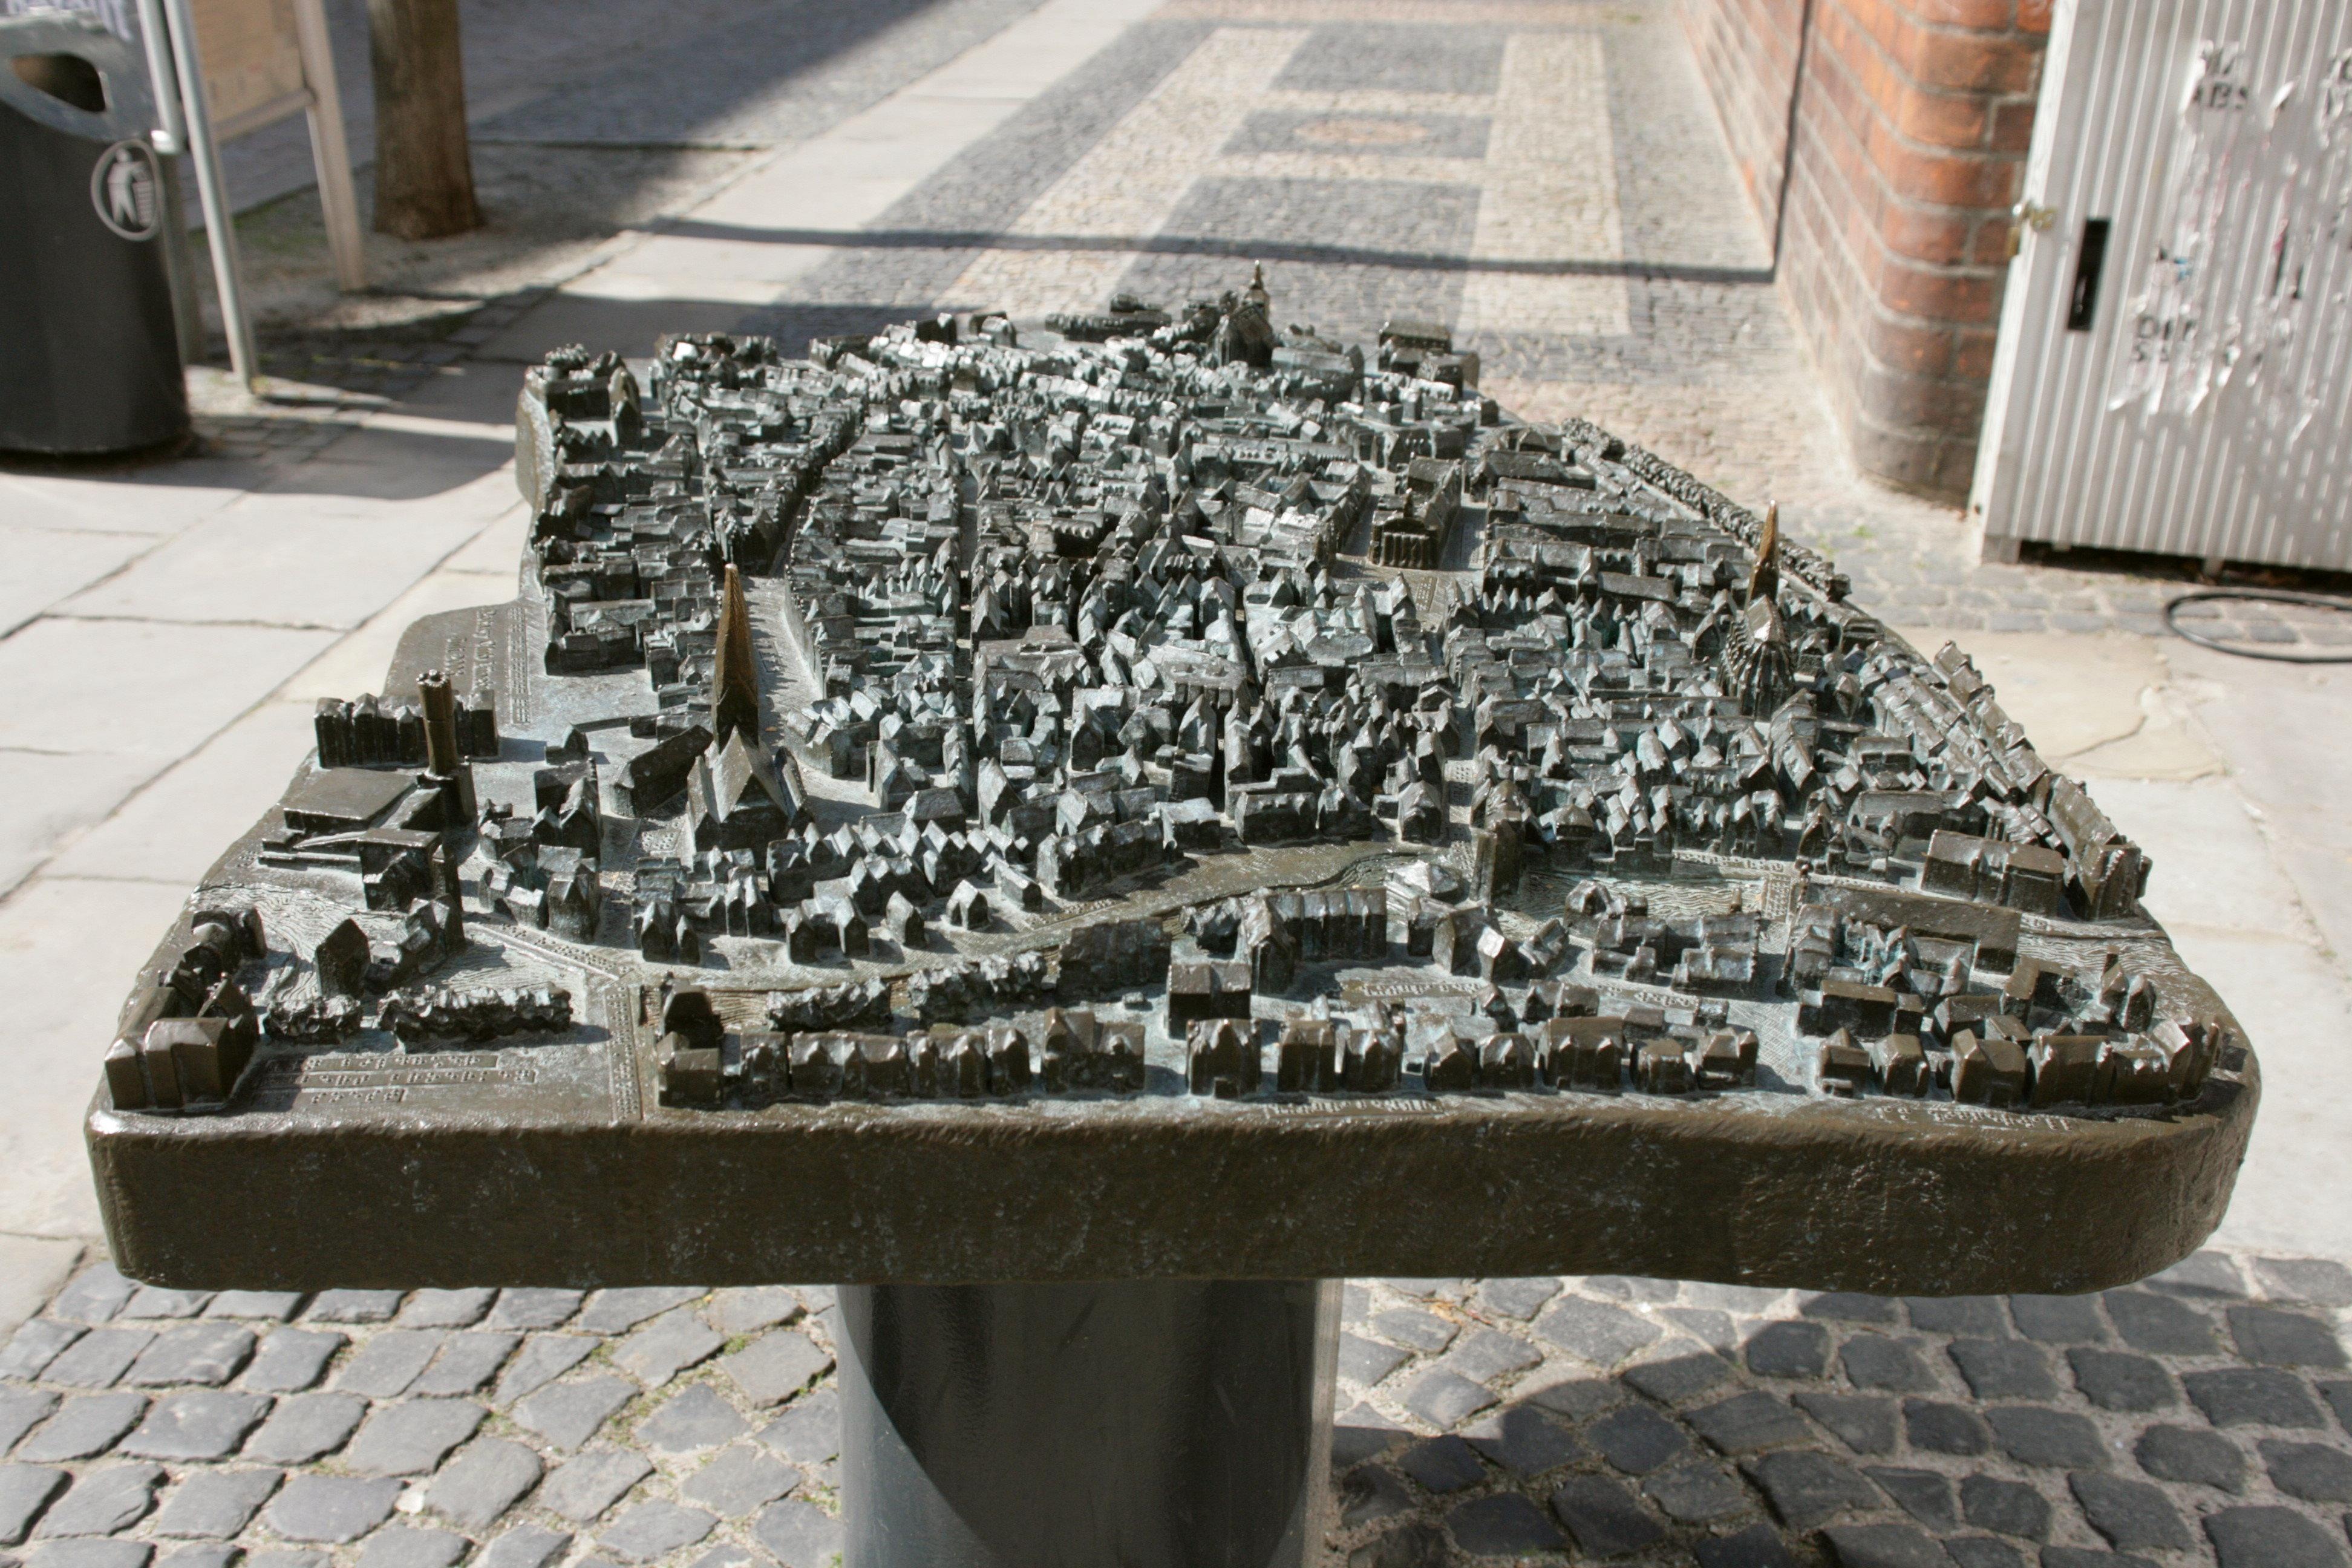 File Luneburg Am Markt Rathaus Stadtmodell 02 Ies Jpg